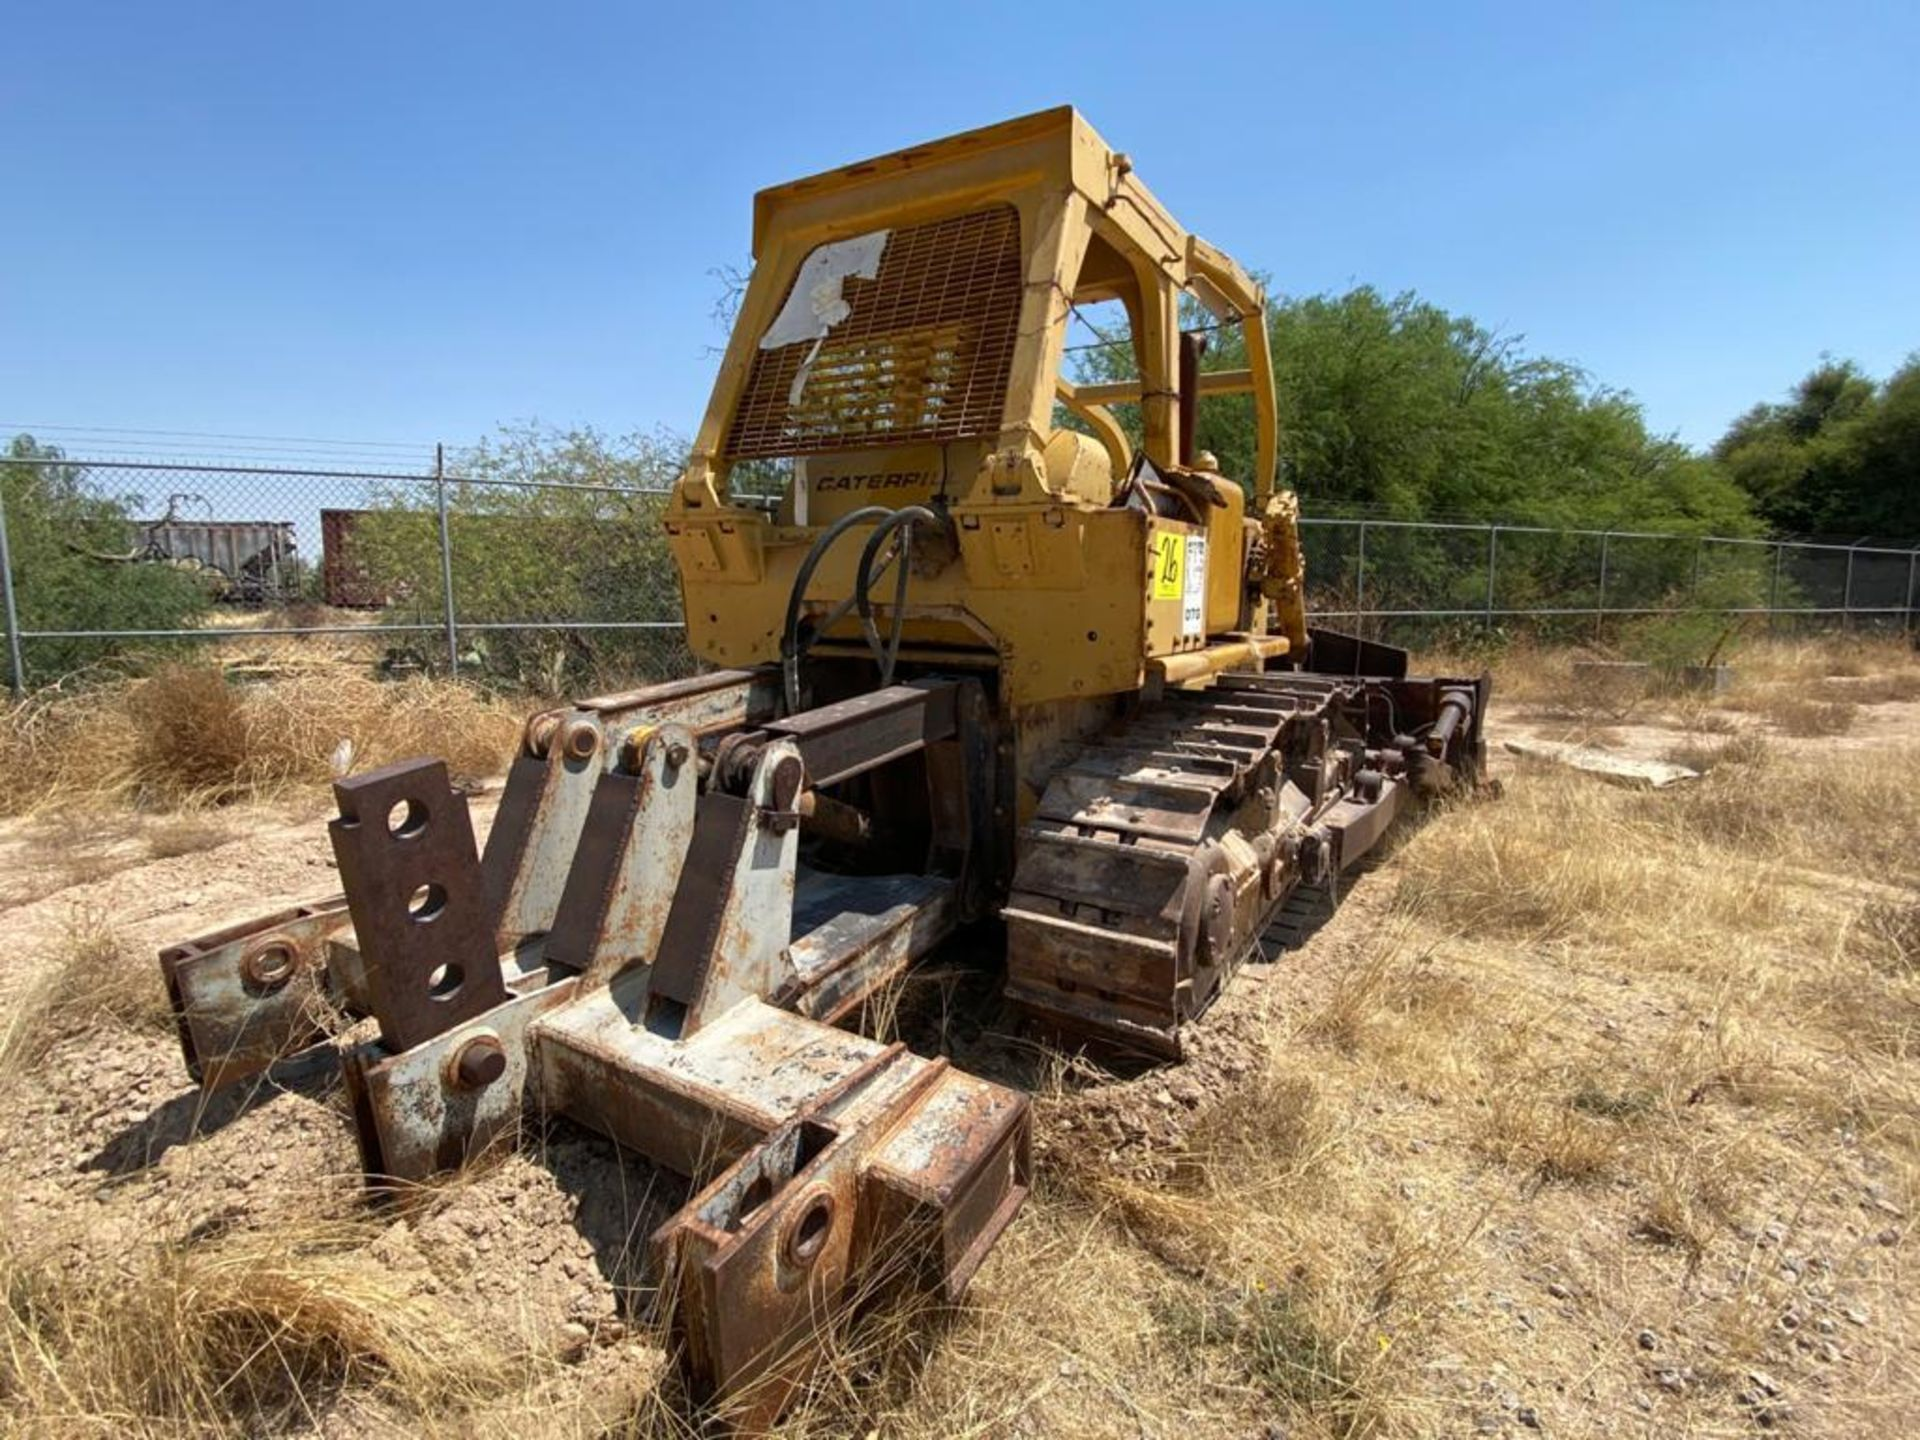 Caterpillar D7G Bulldozer, Serial number 92V5897, Diesel motor - Image 13 of 48